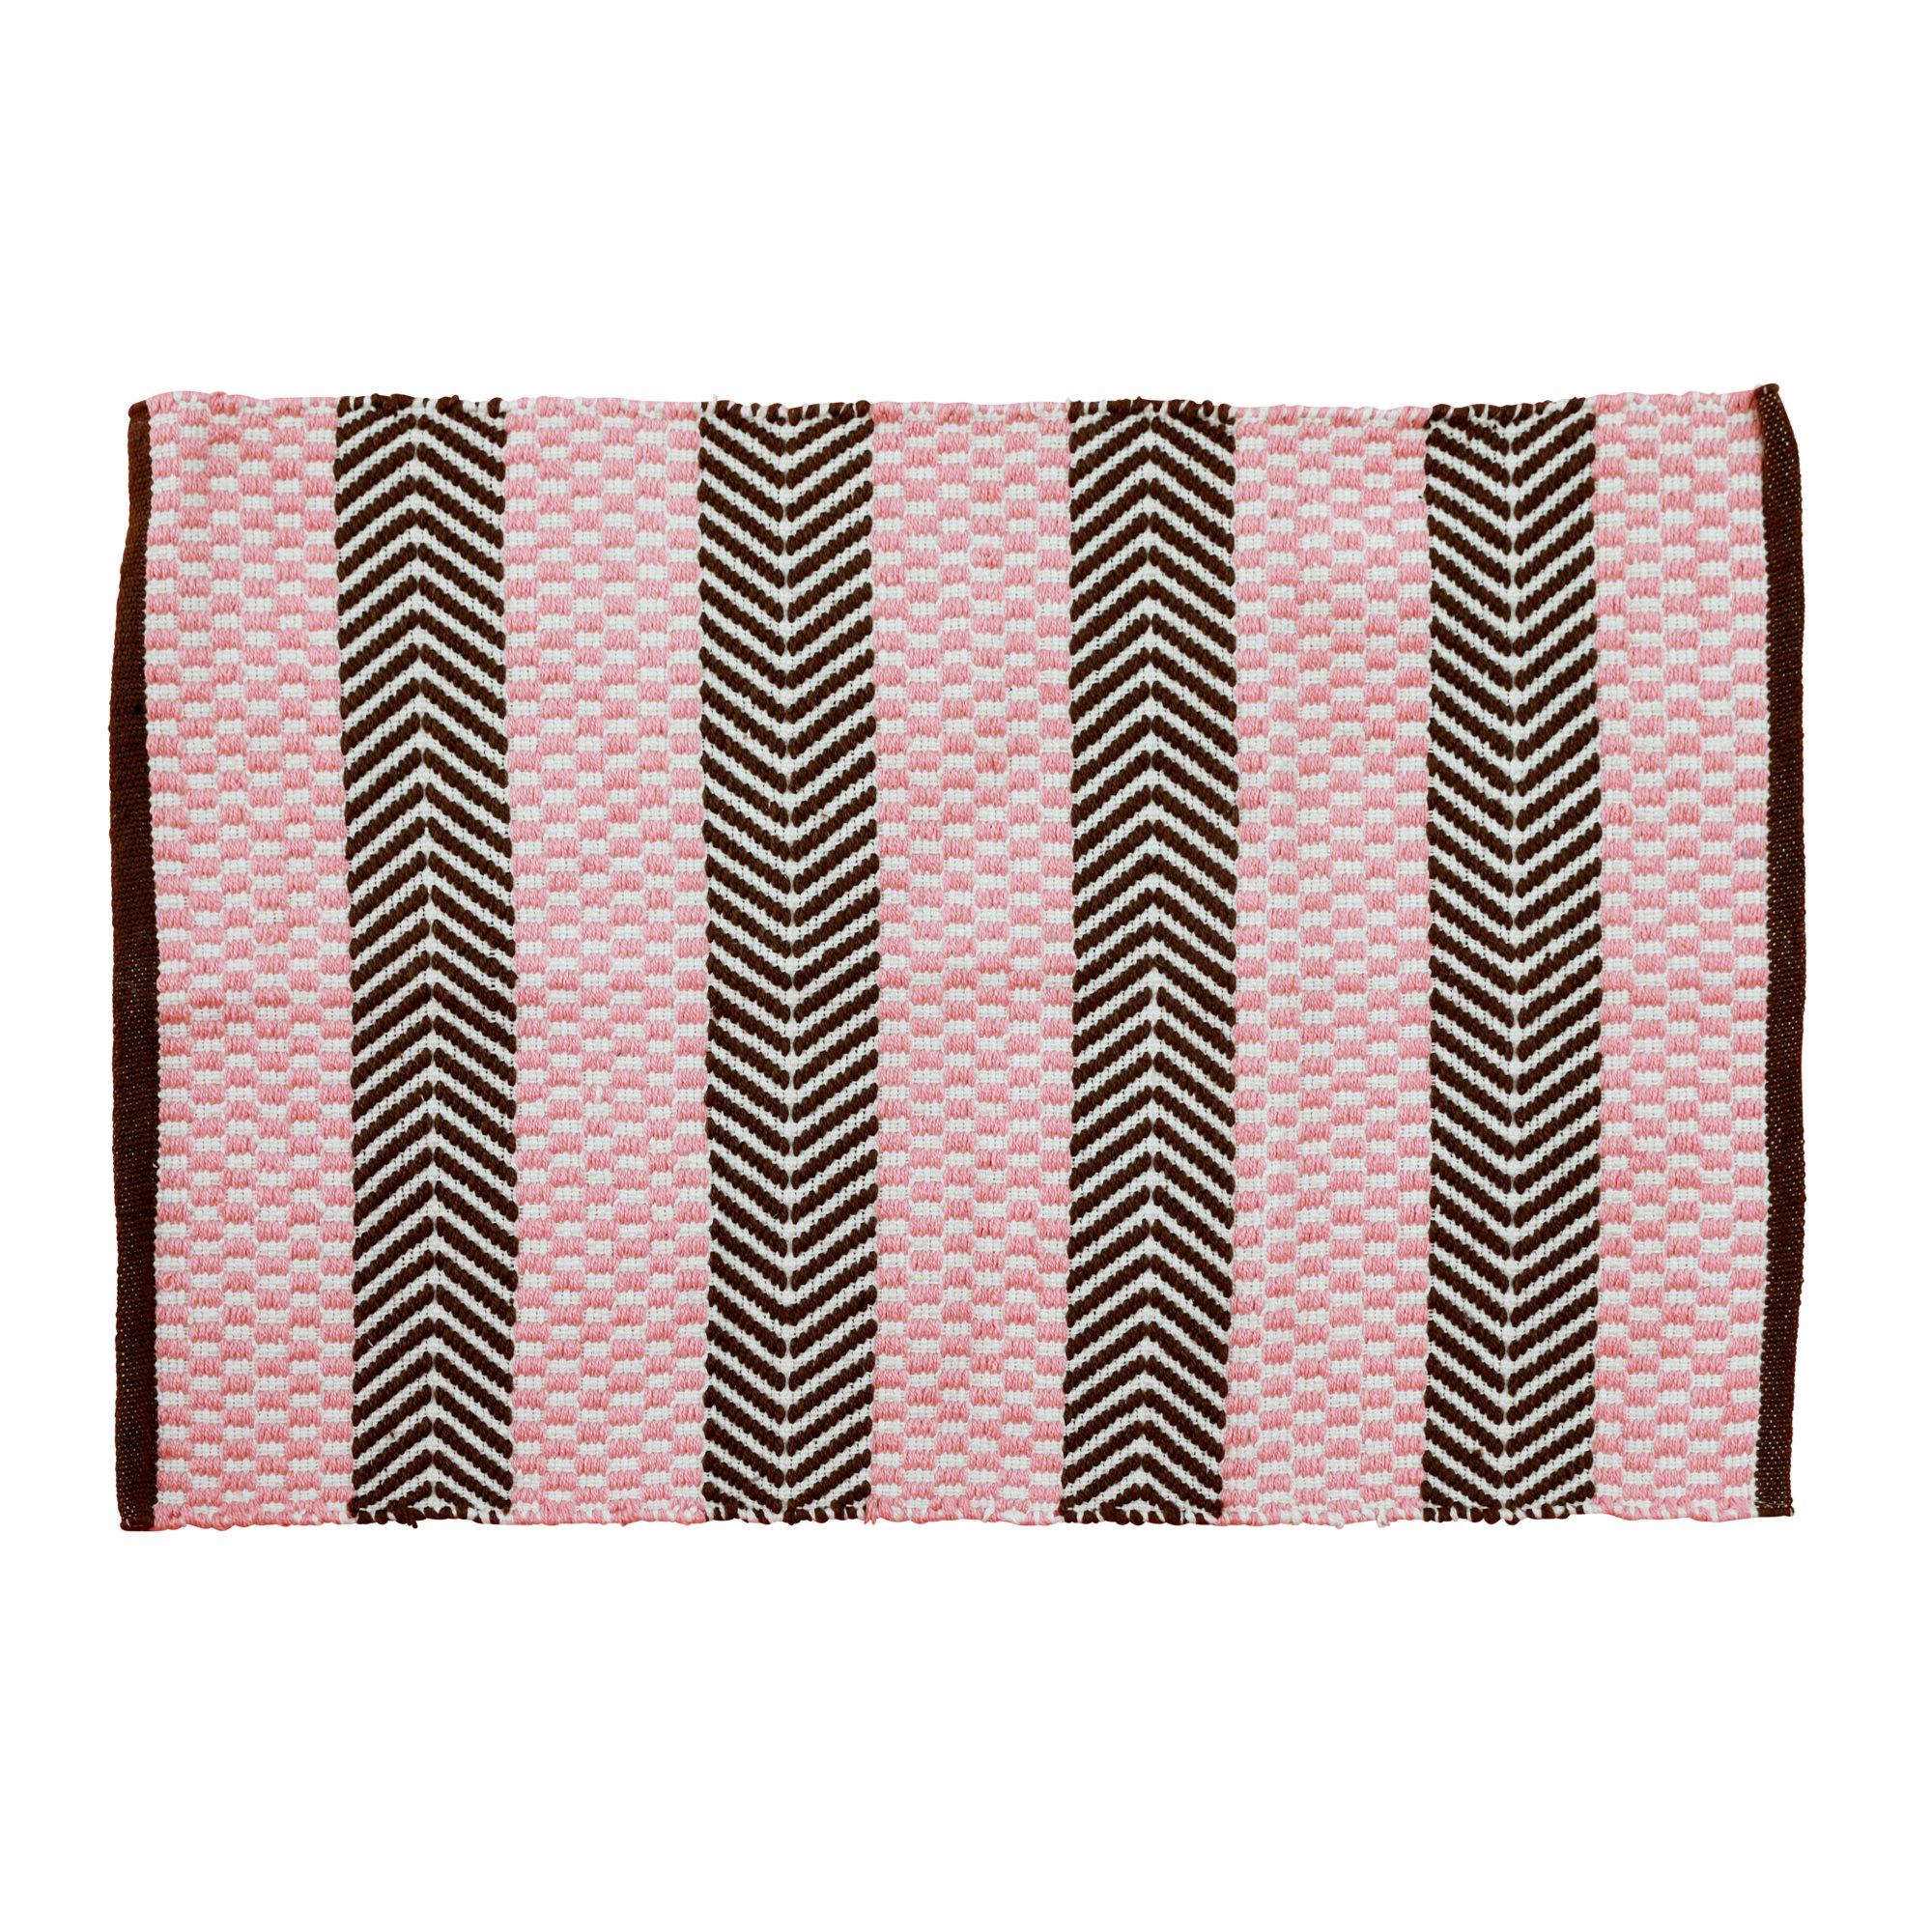 Rice - Handmade Recycled Plastic Floormat 60 x 90 cm - Pink & Brown